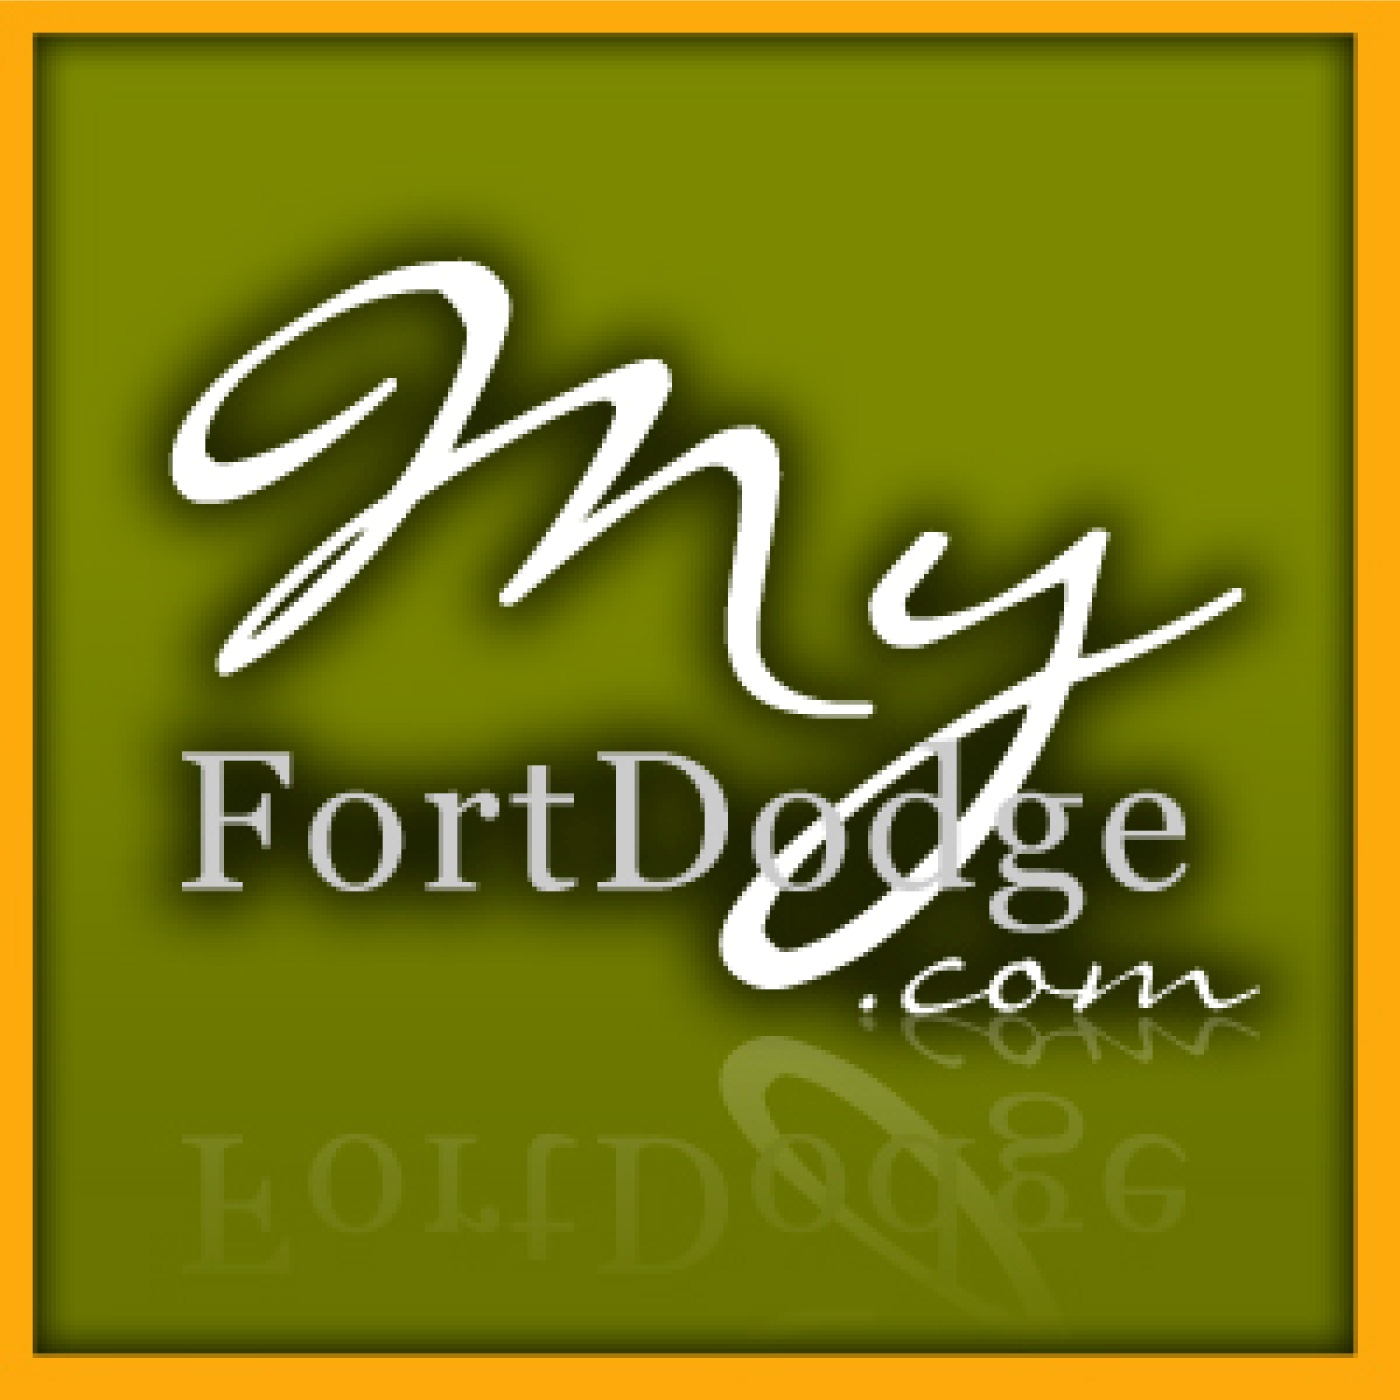 My Fort Dodge Iowa Video